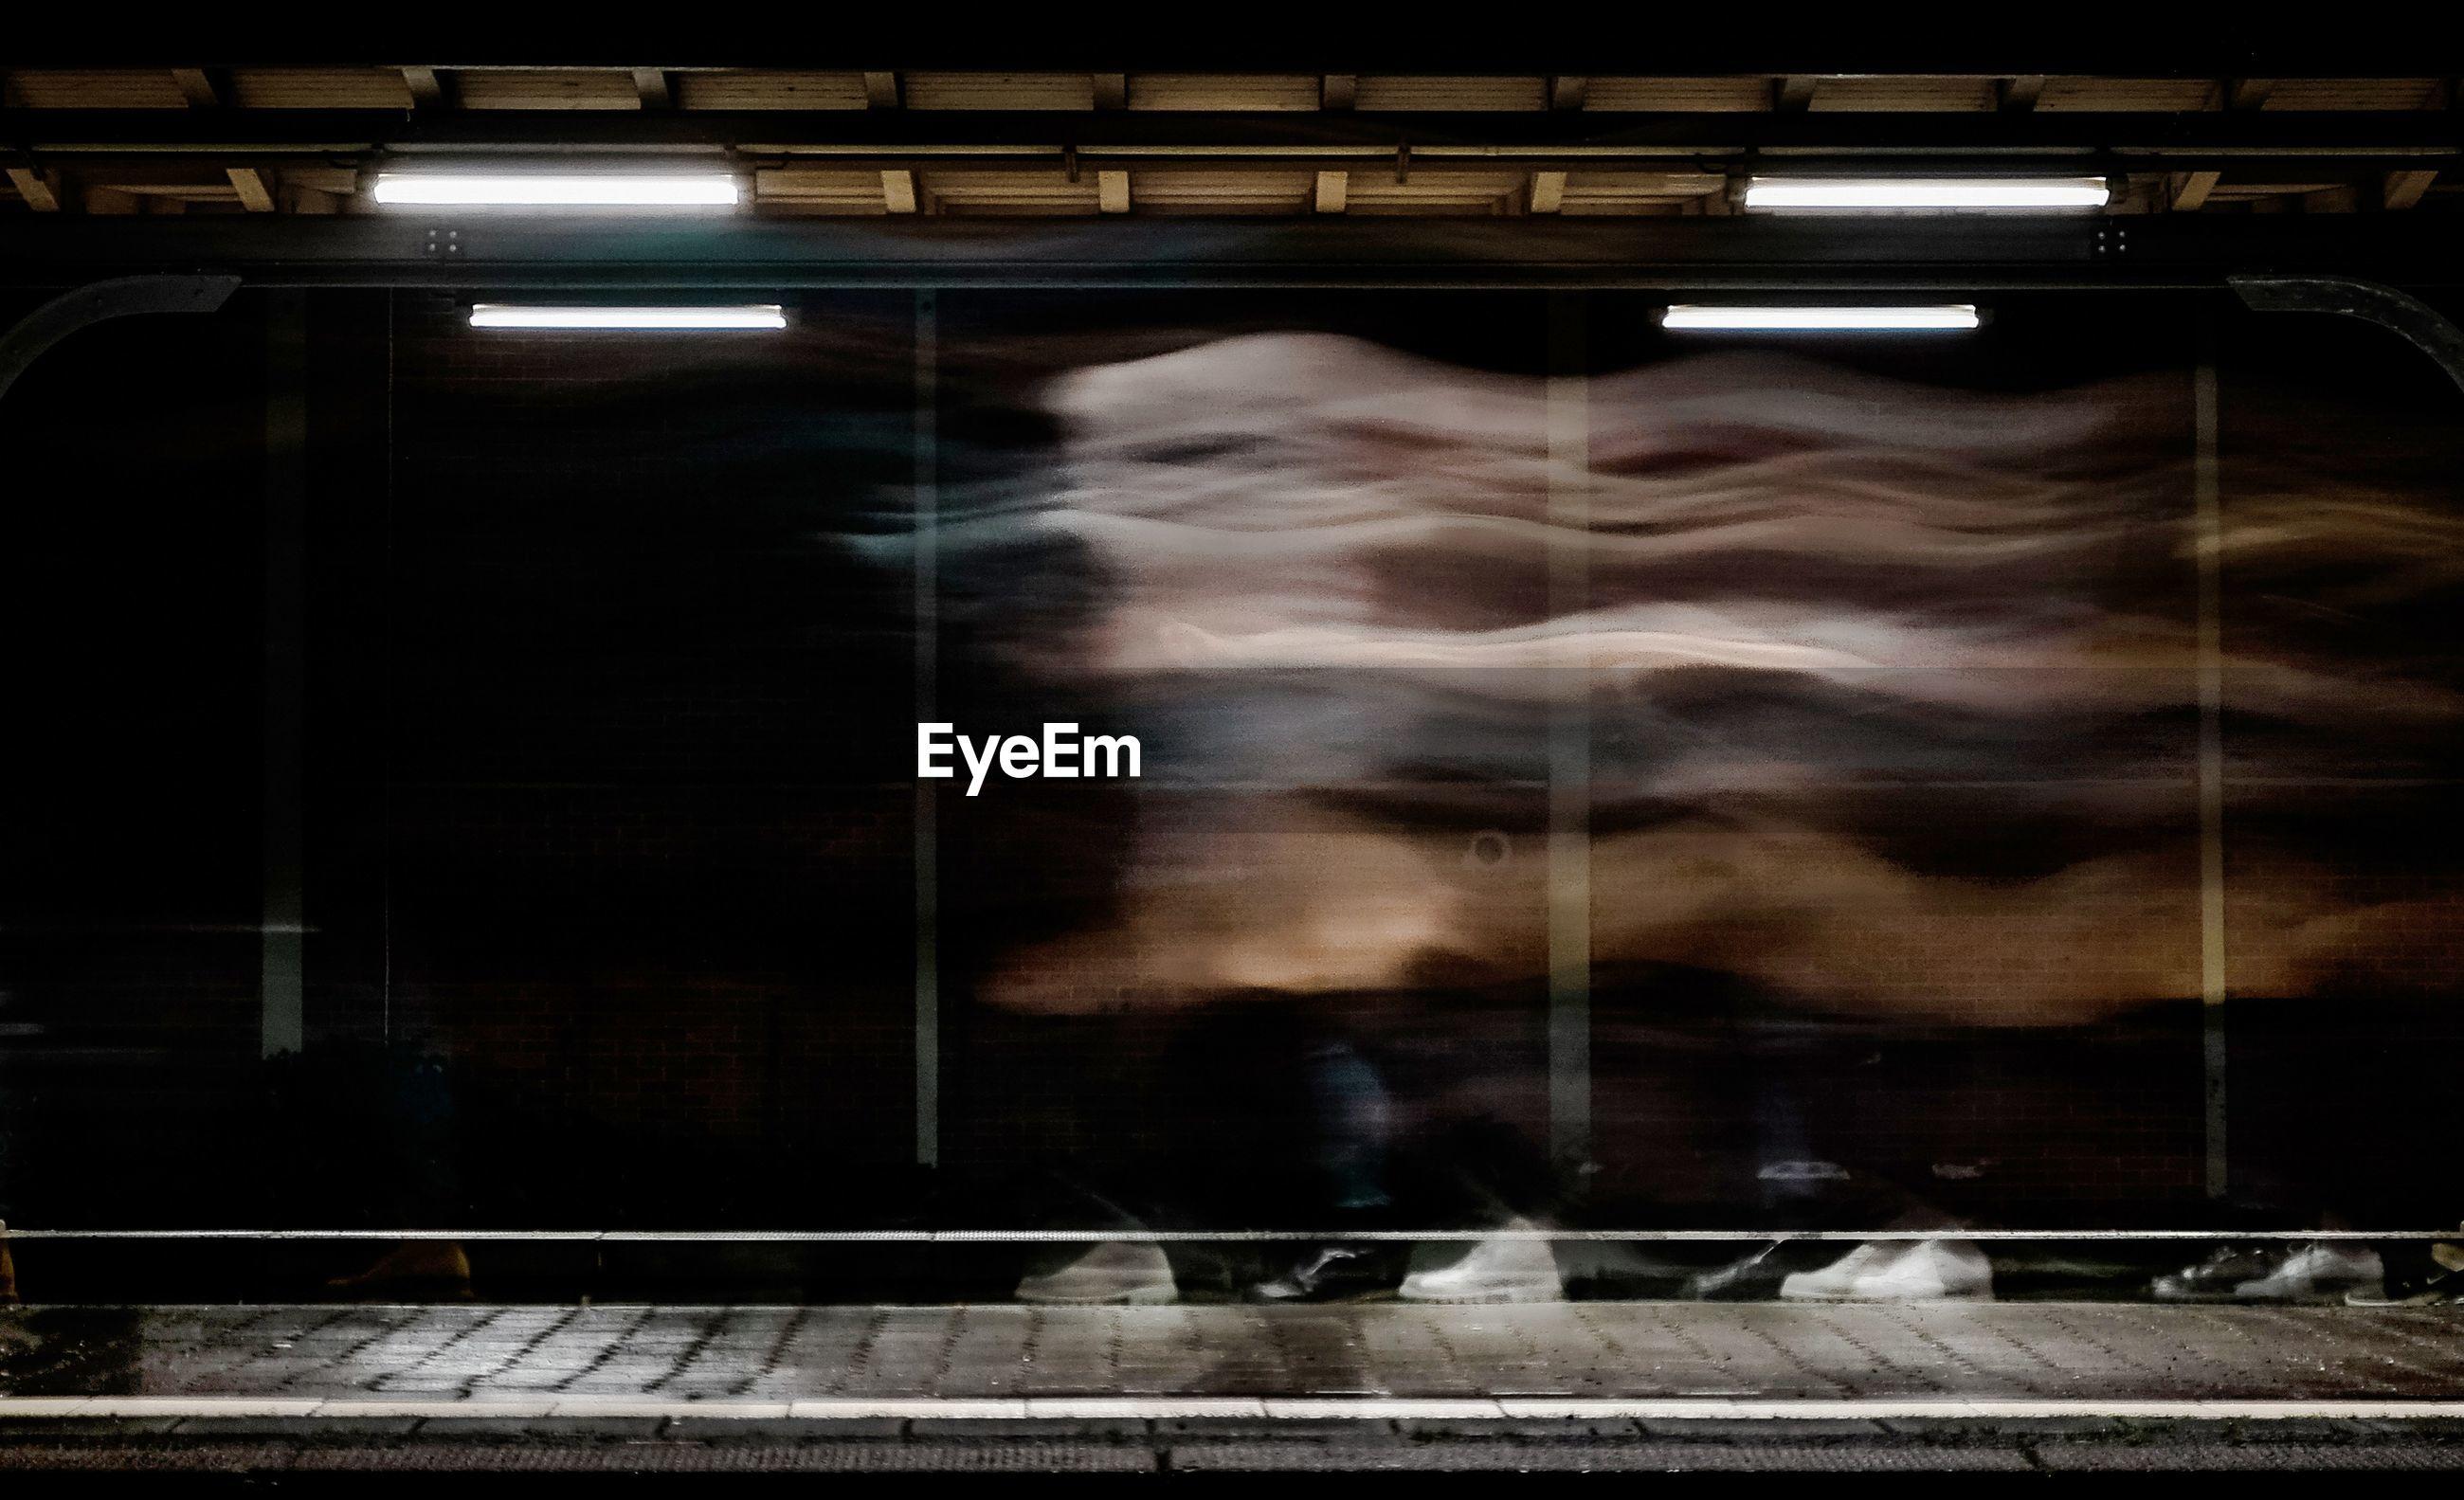 REFLECTION OF WOMAN ON RAILROAD STATION PLATFORM SEEN THROUGH WINDOW